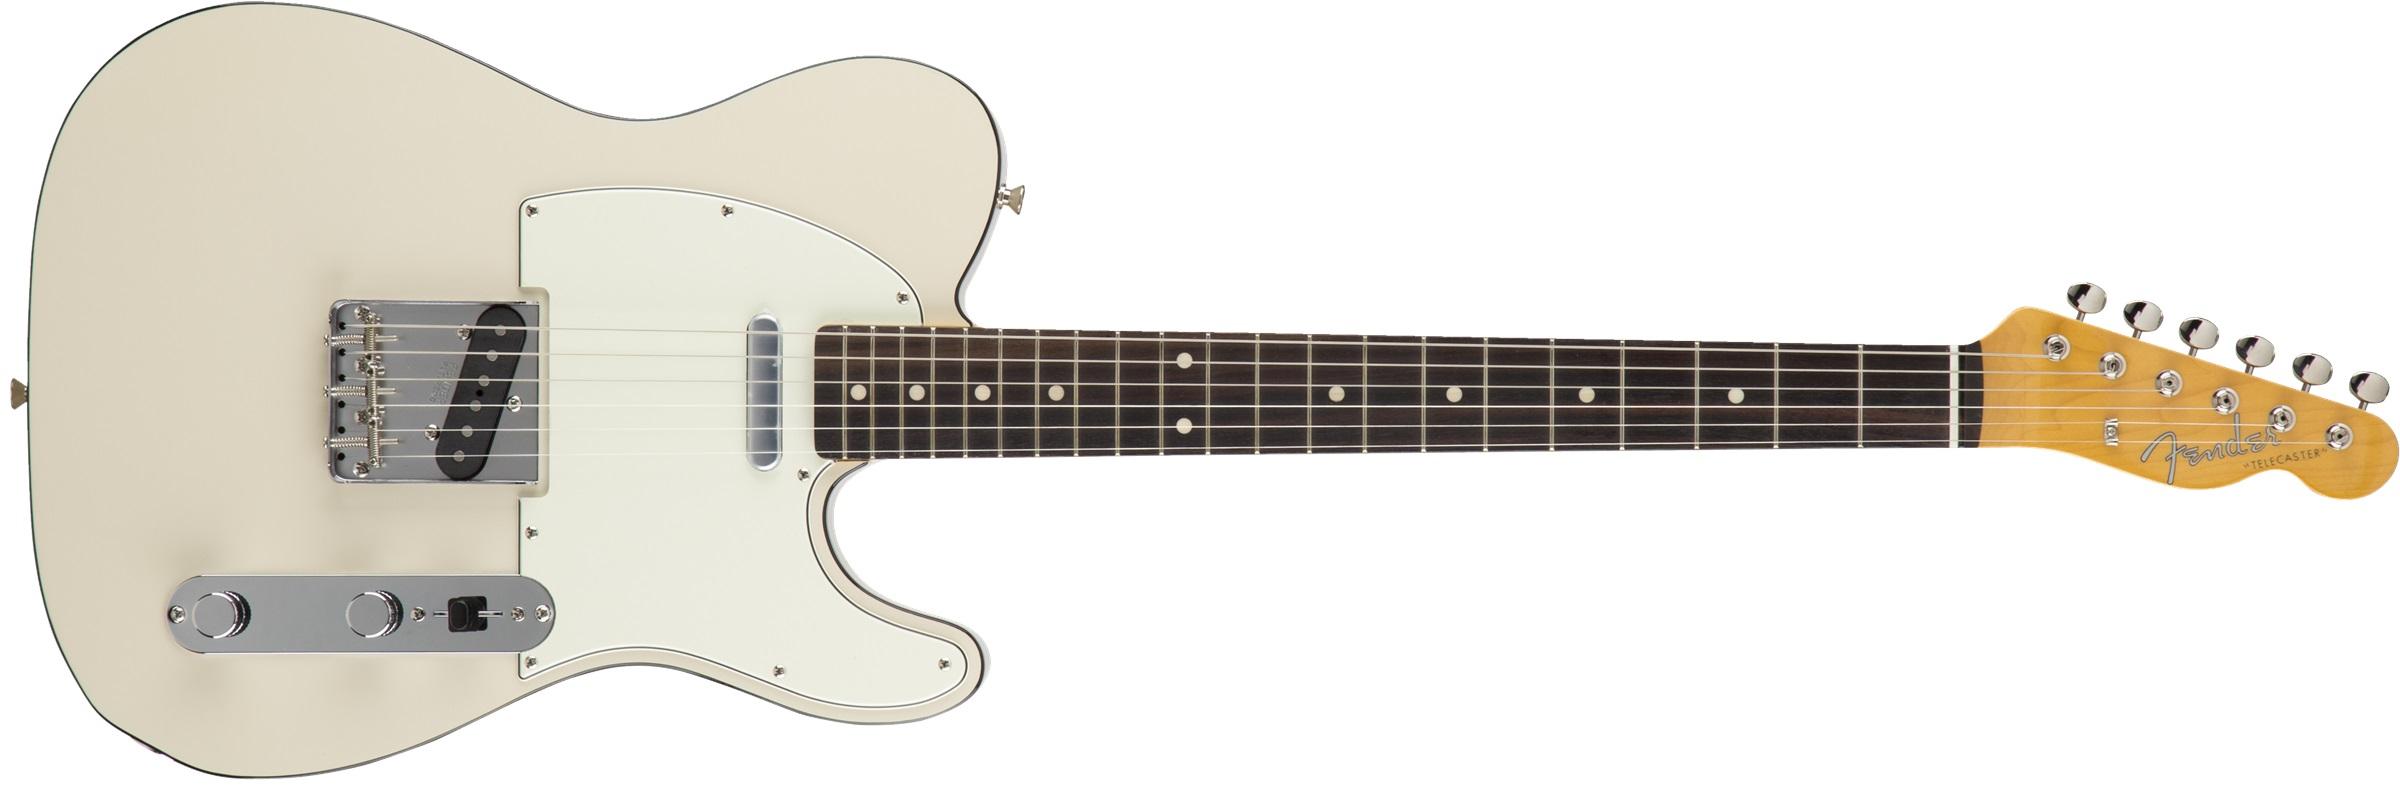 Fender Classic Telecaster Custom RW VWH